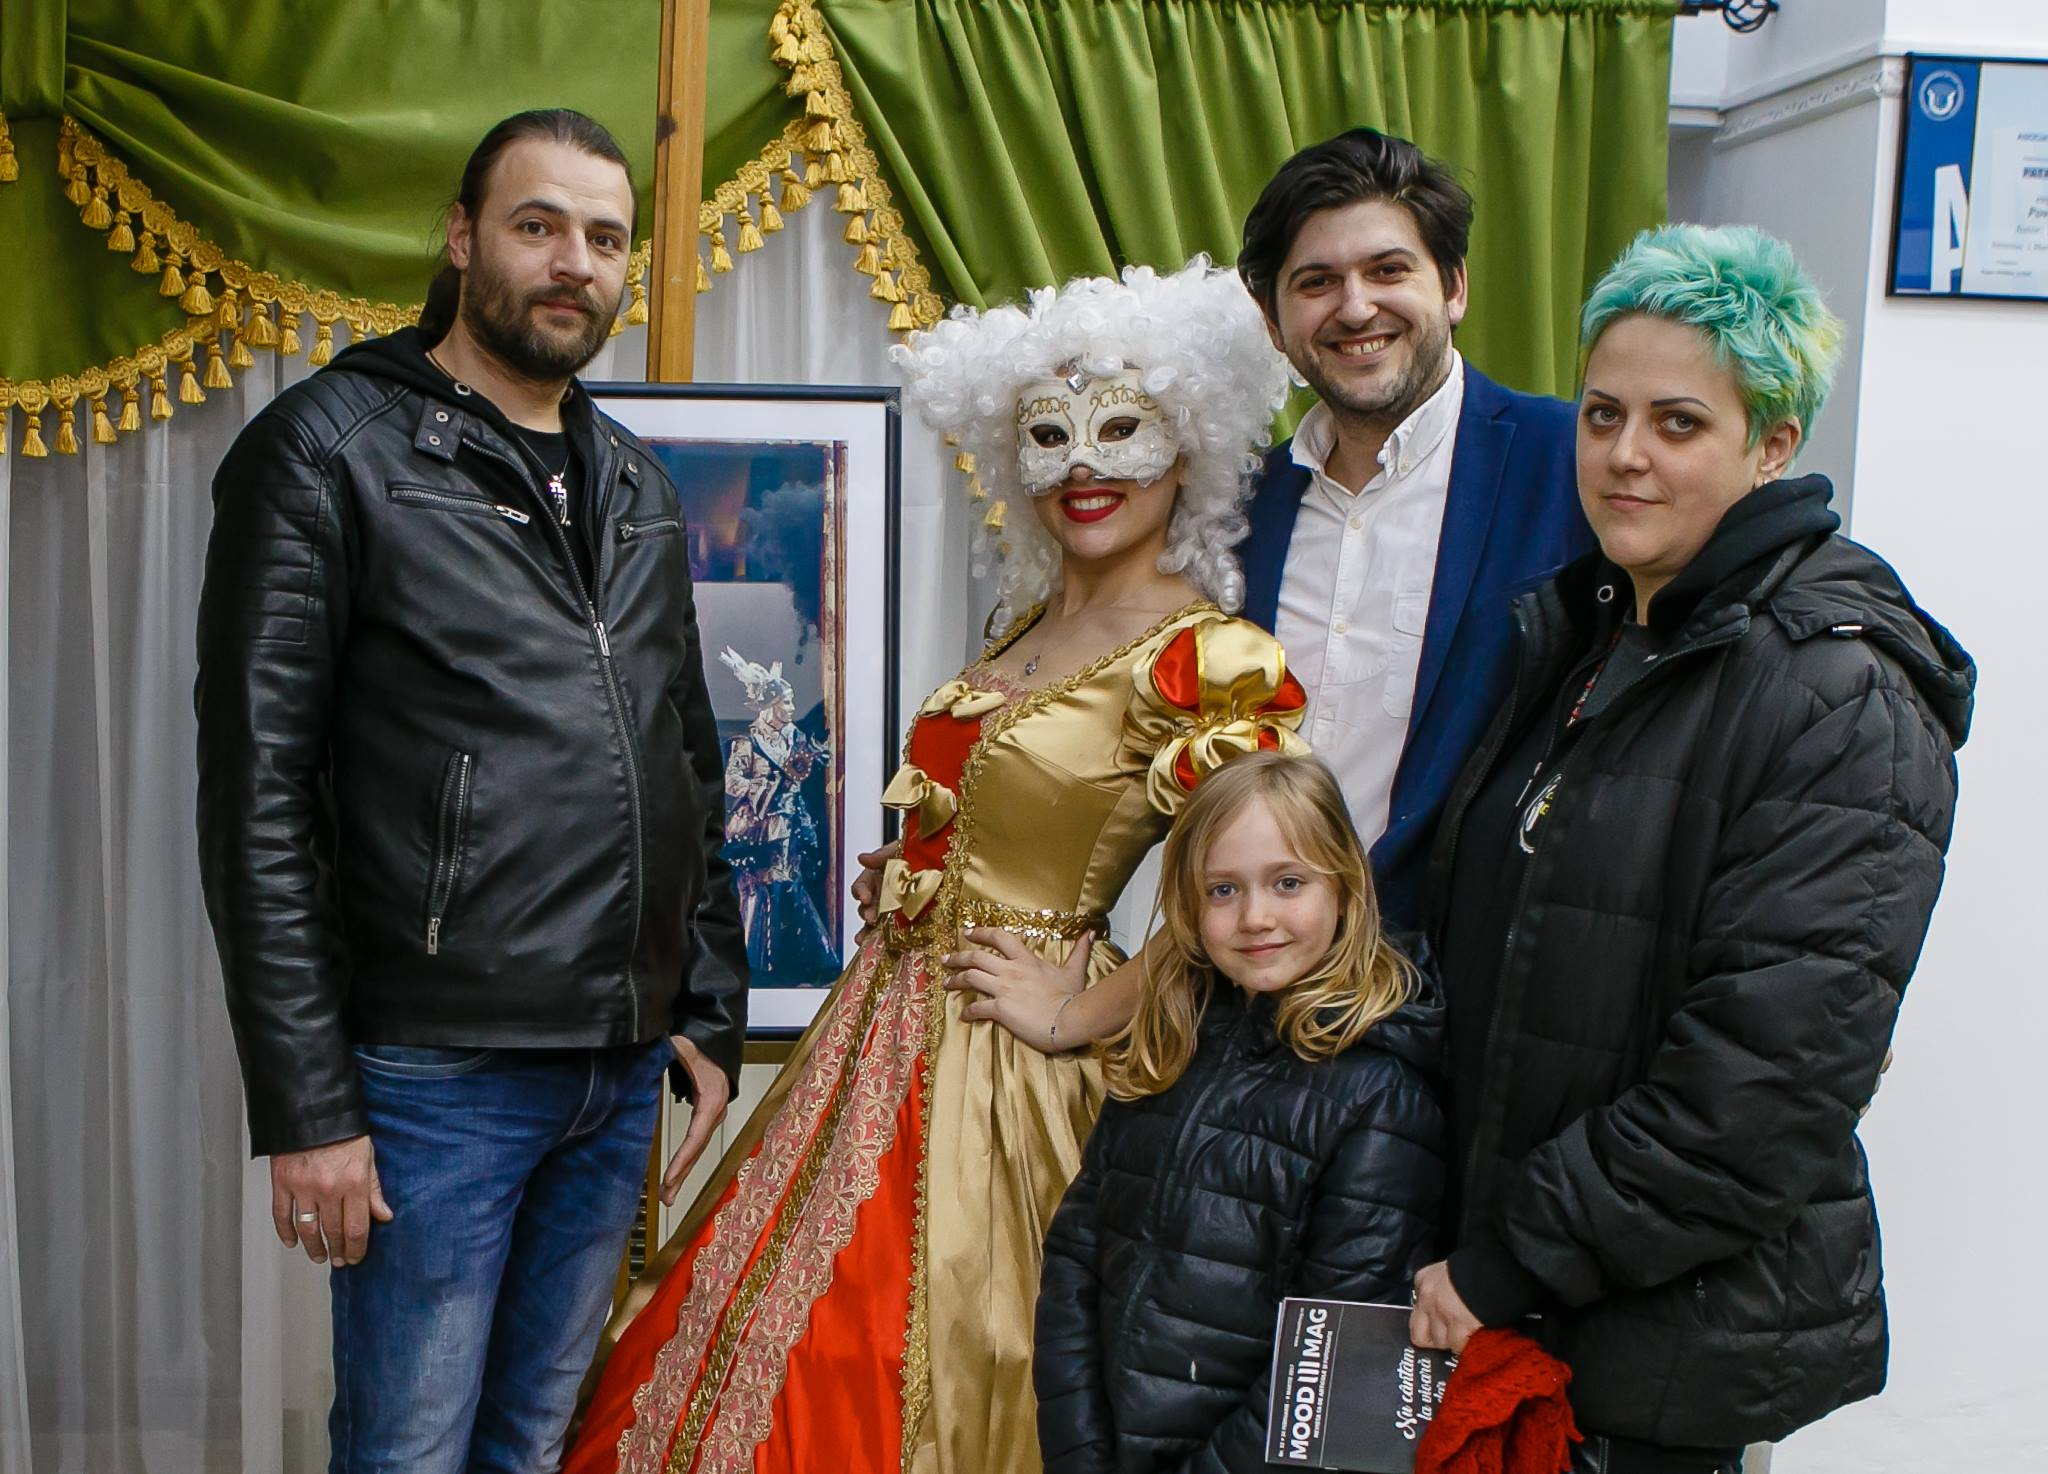 Vernisaj Expozitie de Fotografie Povesti Venetiene Paul Padurariu fotograf profesionist Iasi 1